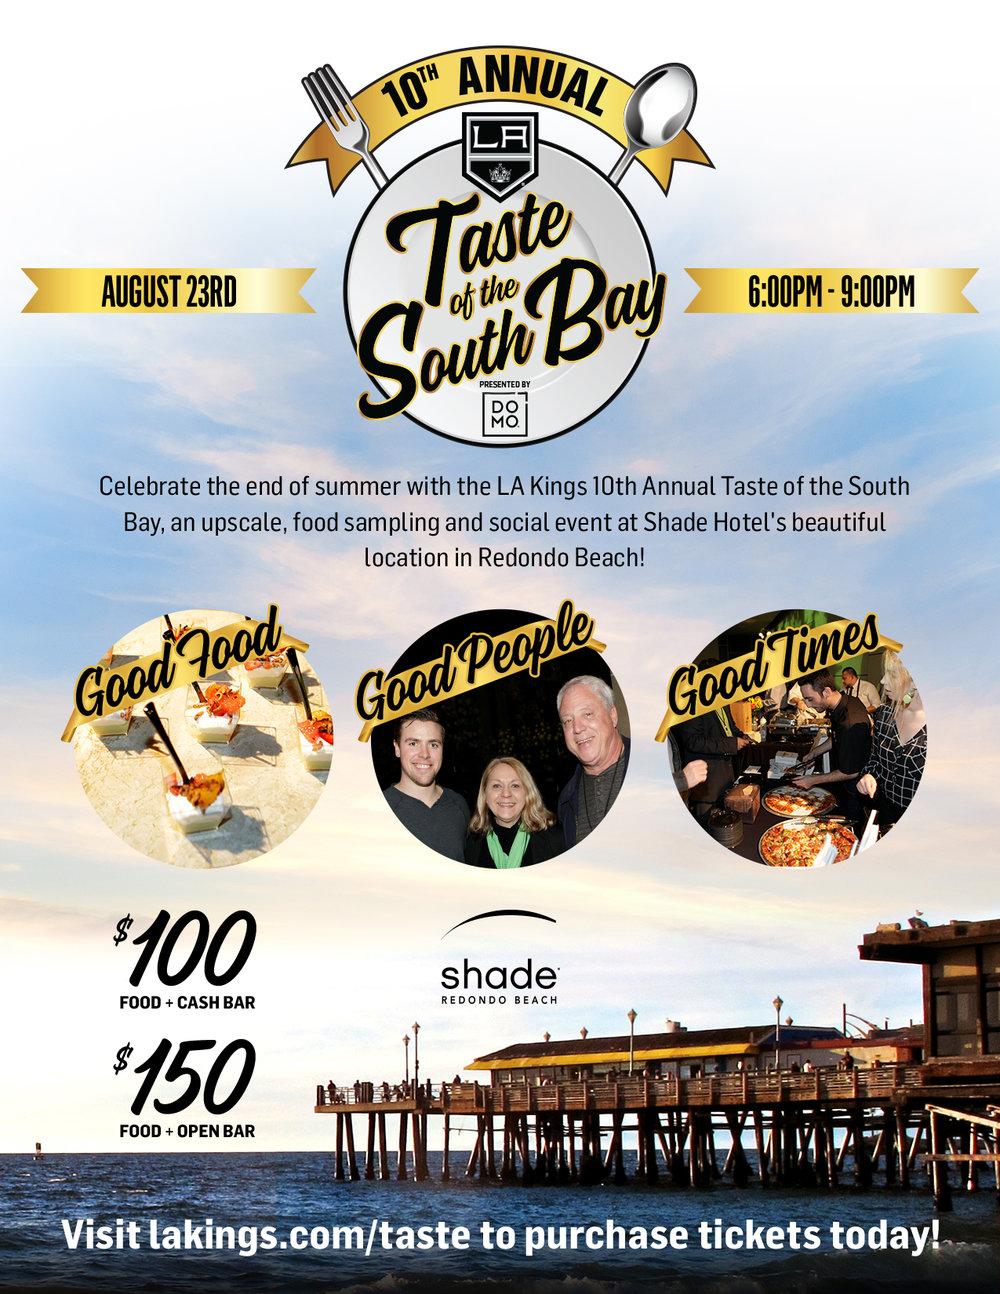 LAK890_Taste_Of_The_SouthBay_Promos_flyer_r2.jpg